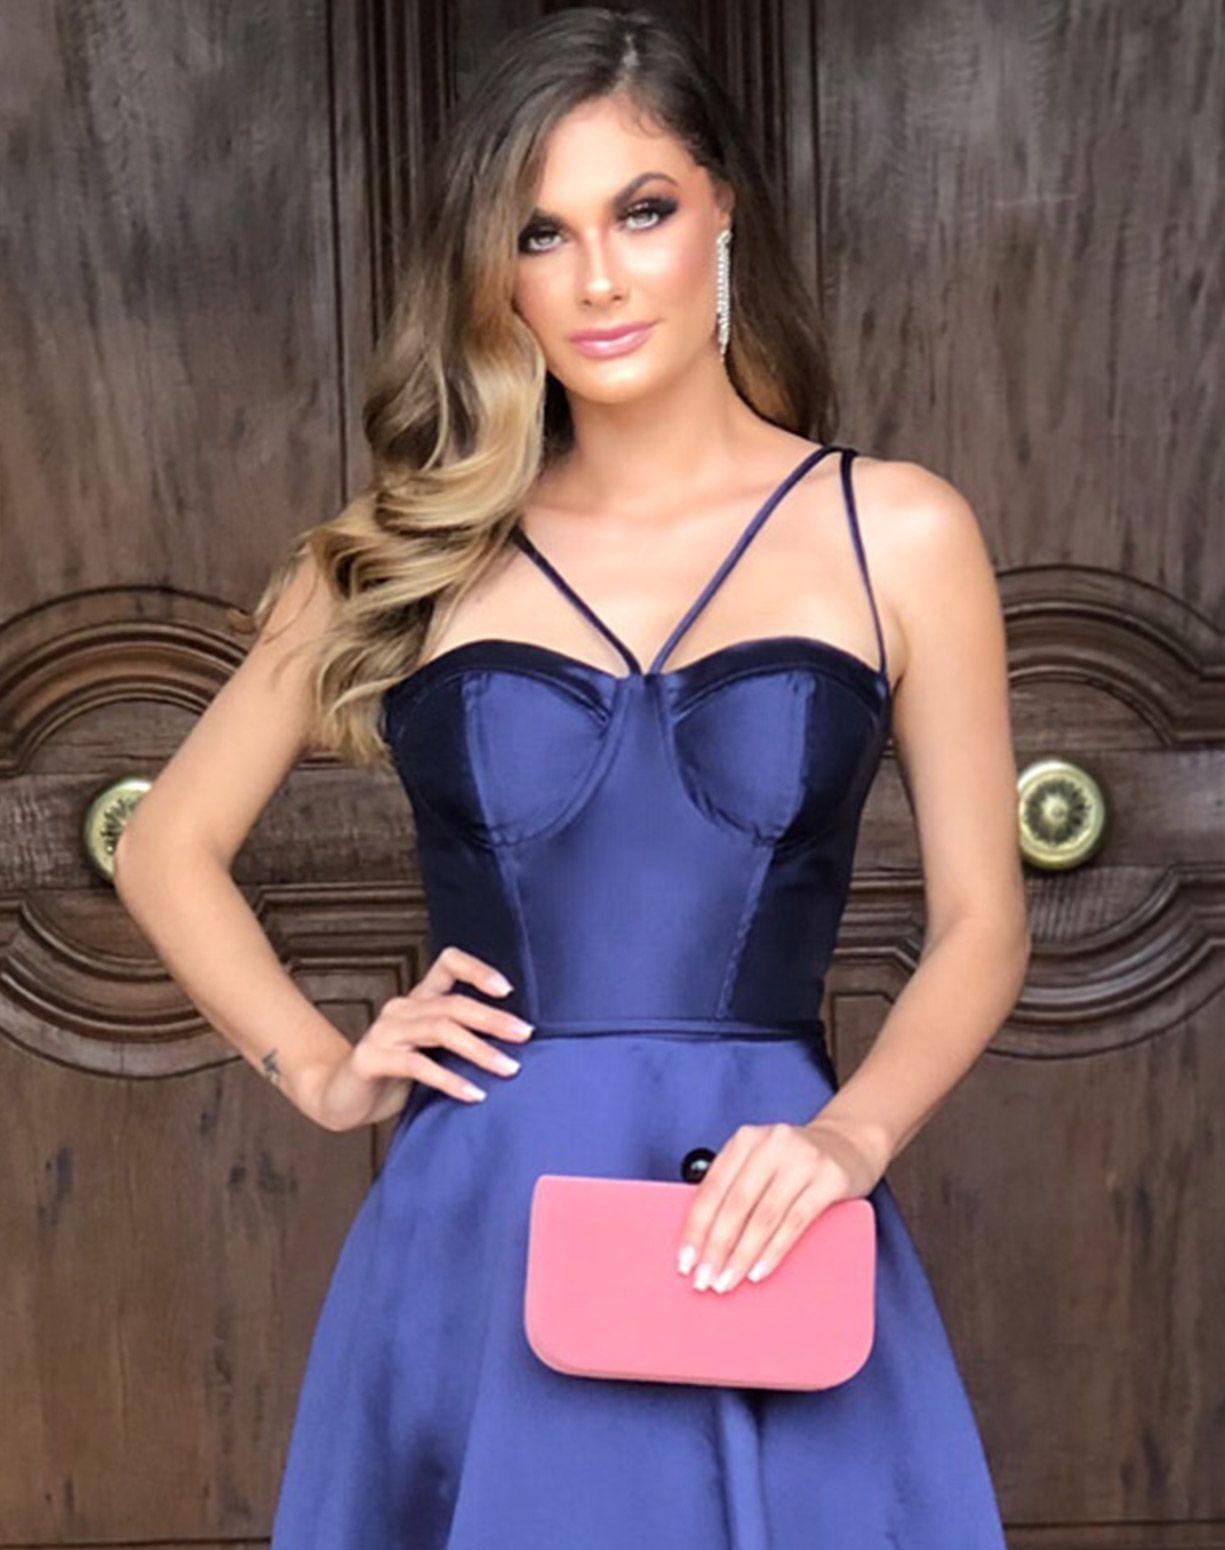 Vestido Azul Marinho Corpete em Zibeline